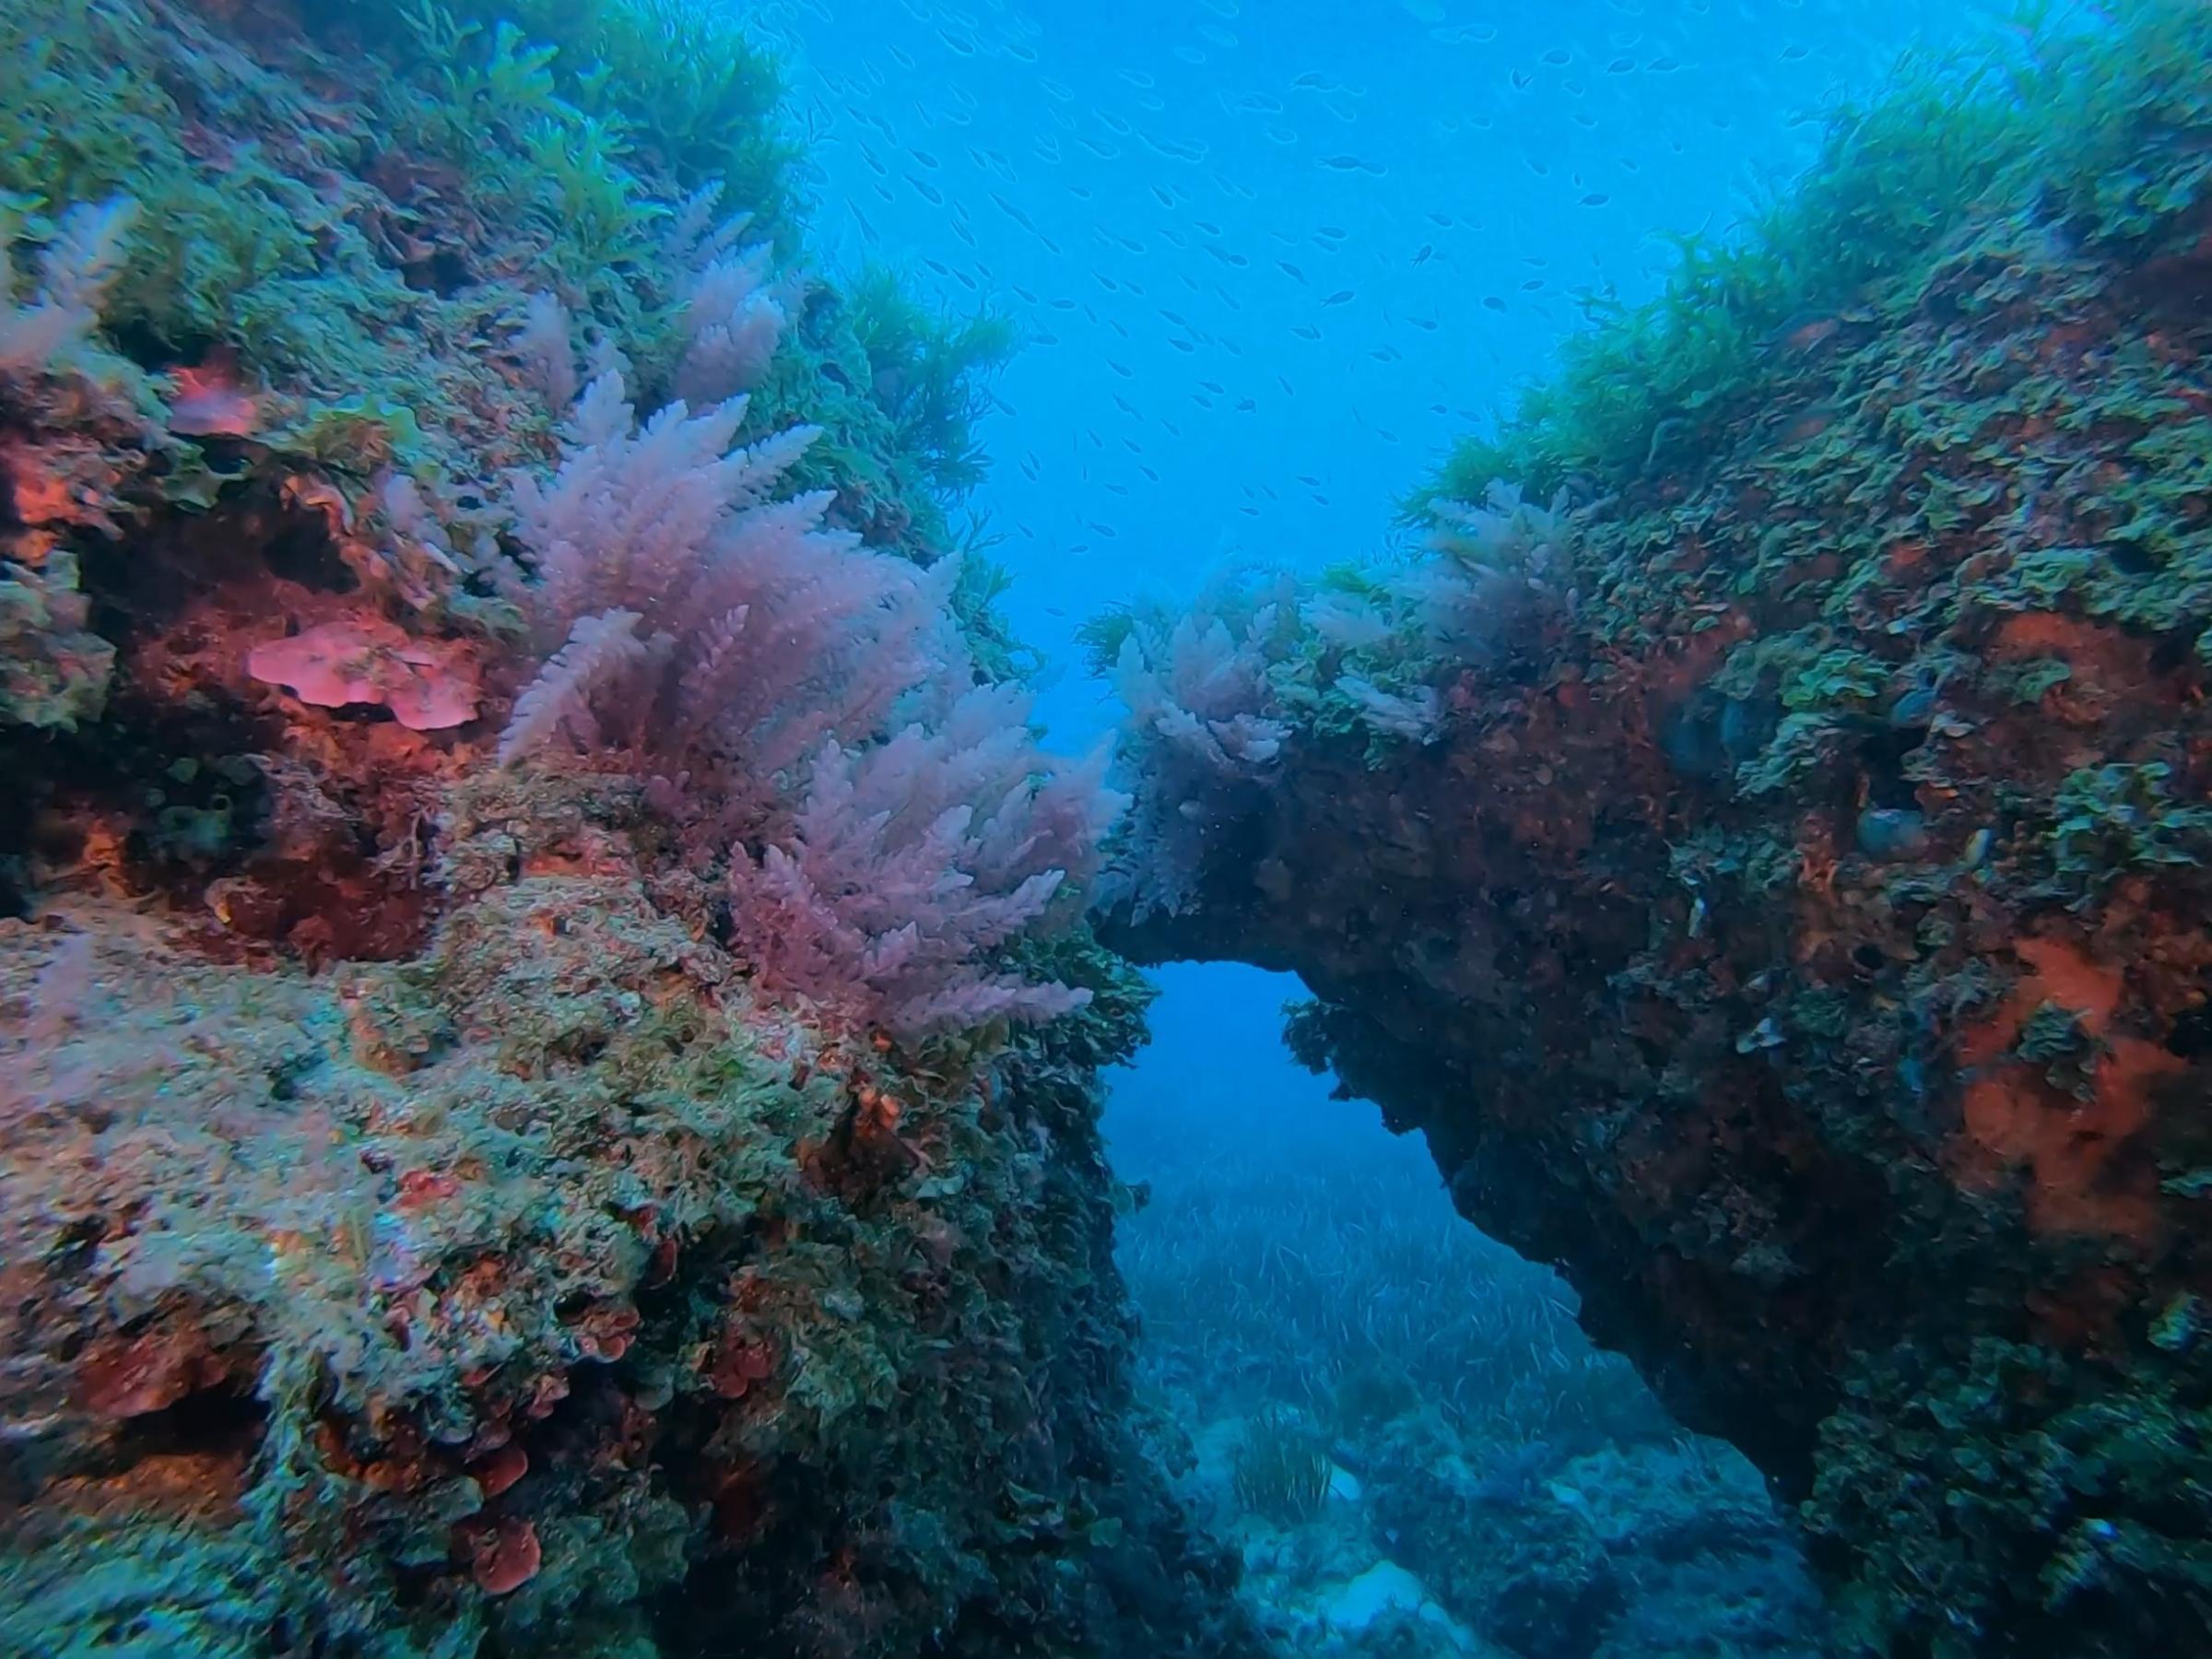 St Paul's Reef [Adam Sant]